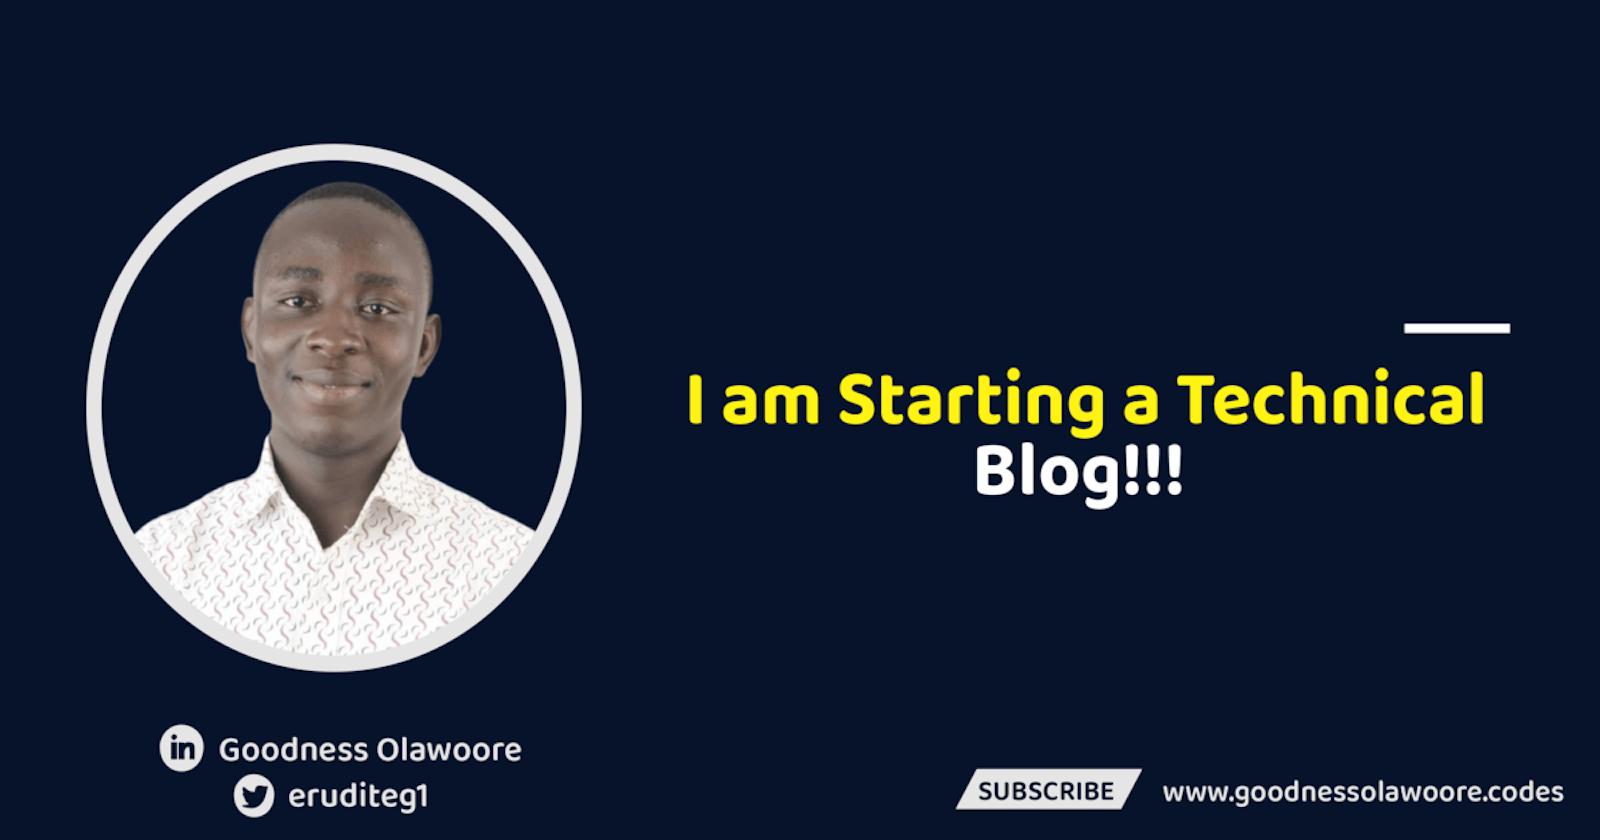 I am starting a technical blog!!!